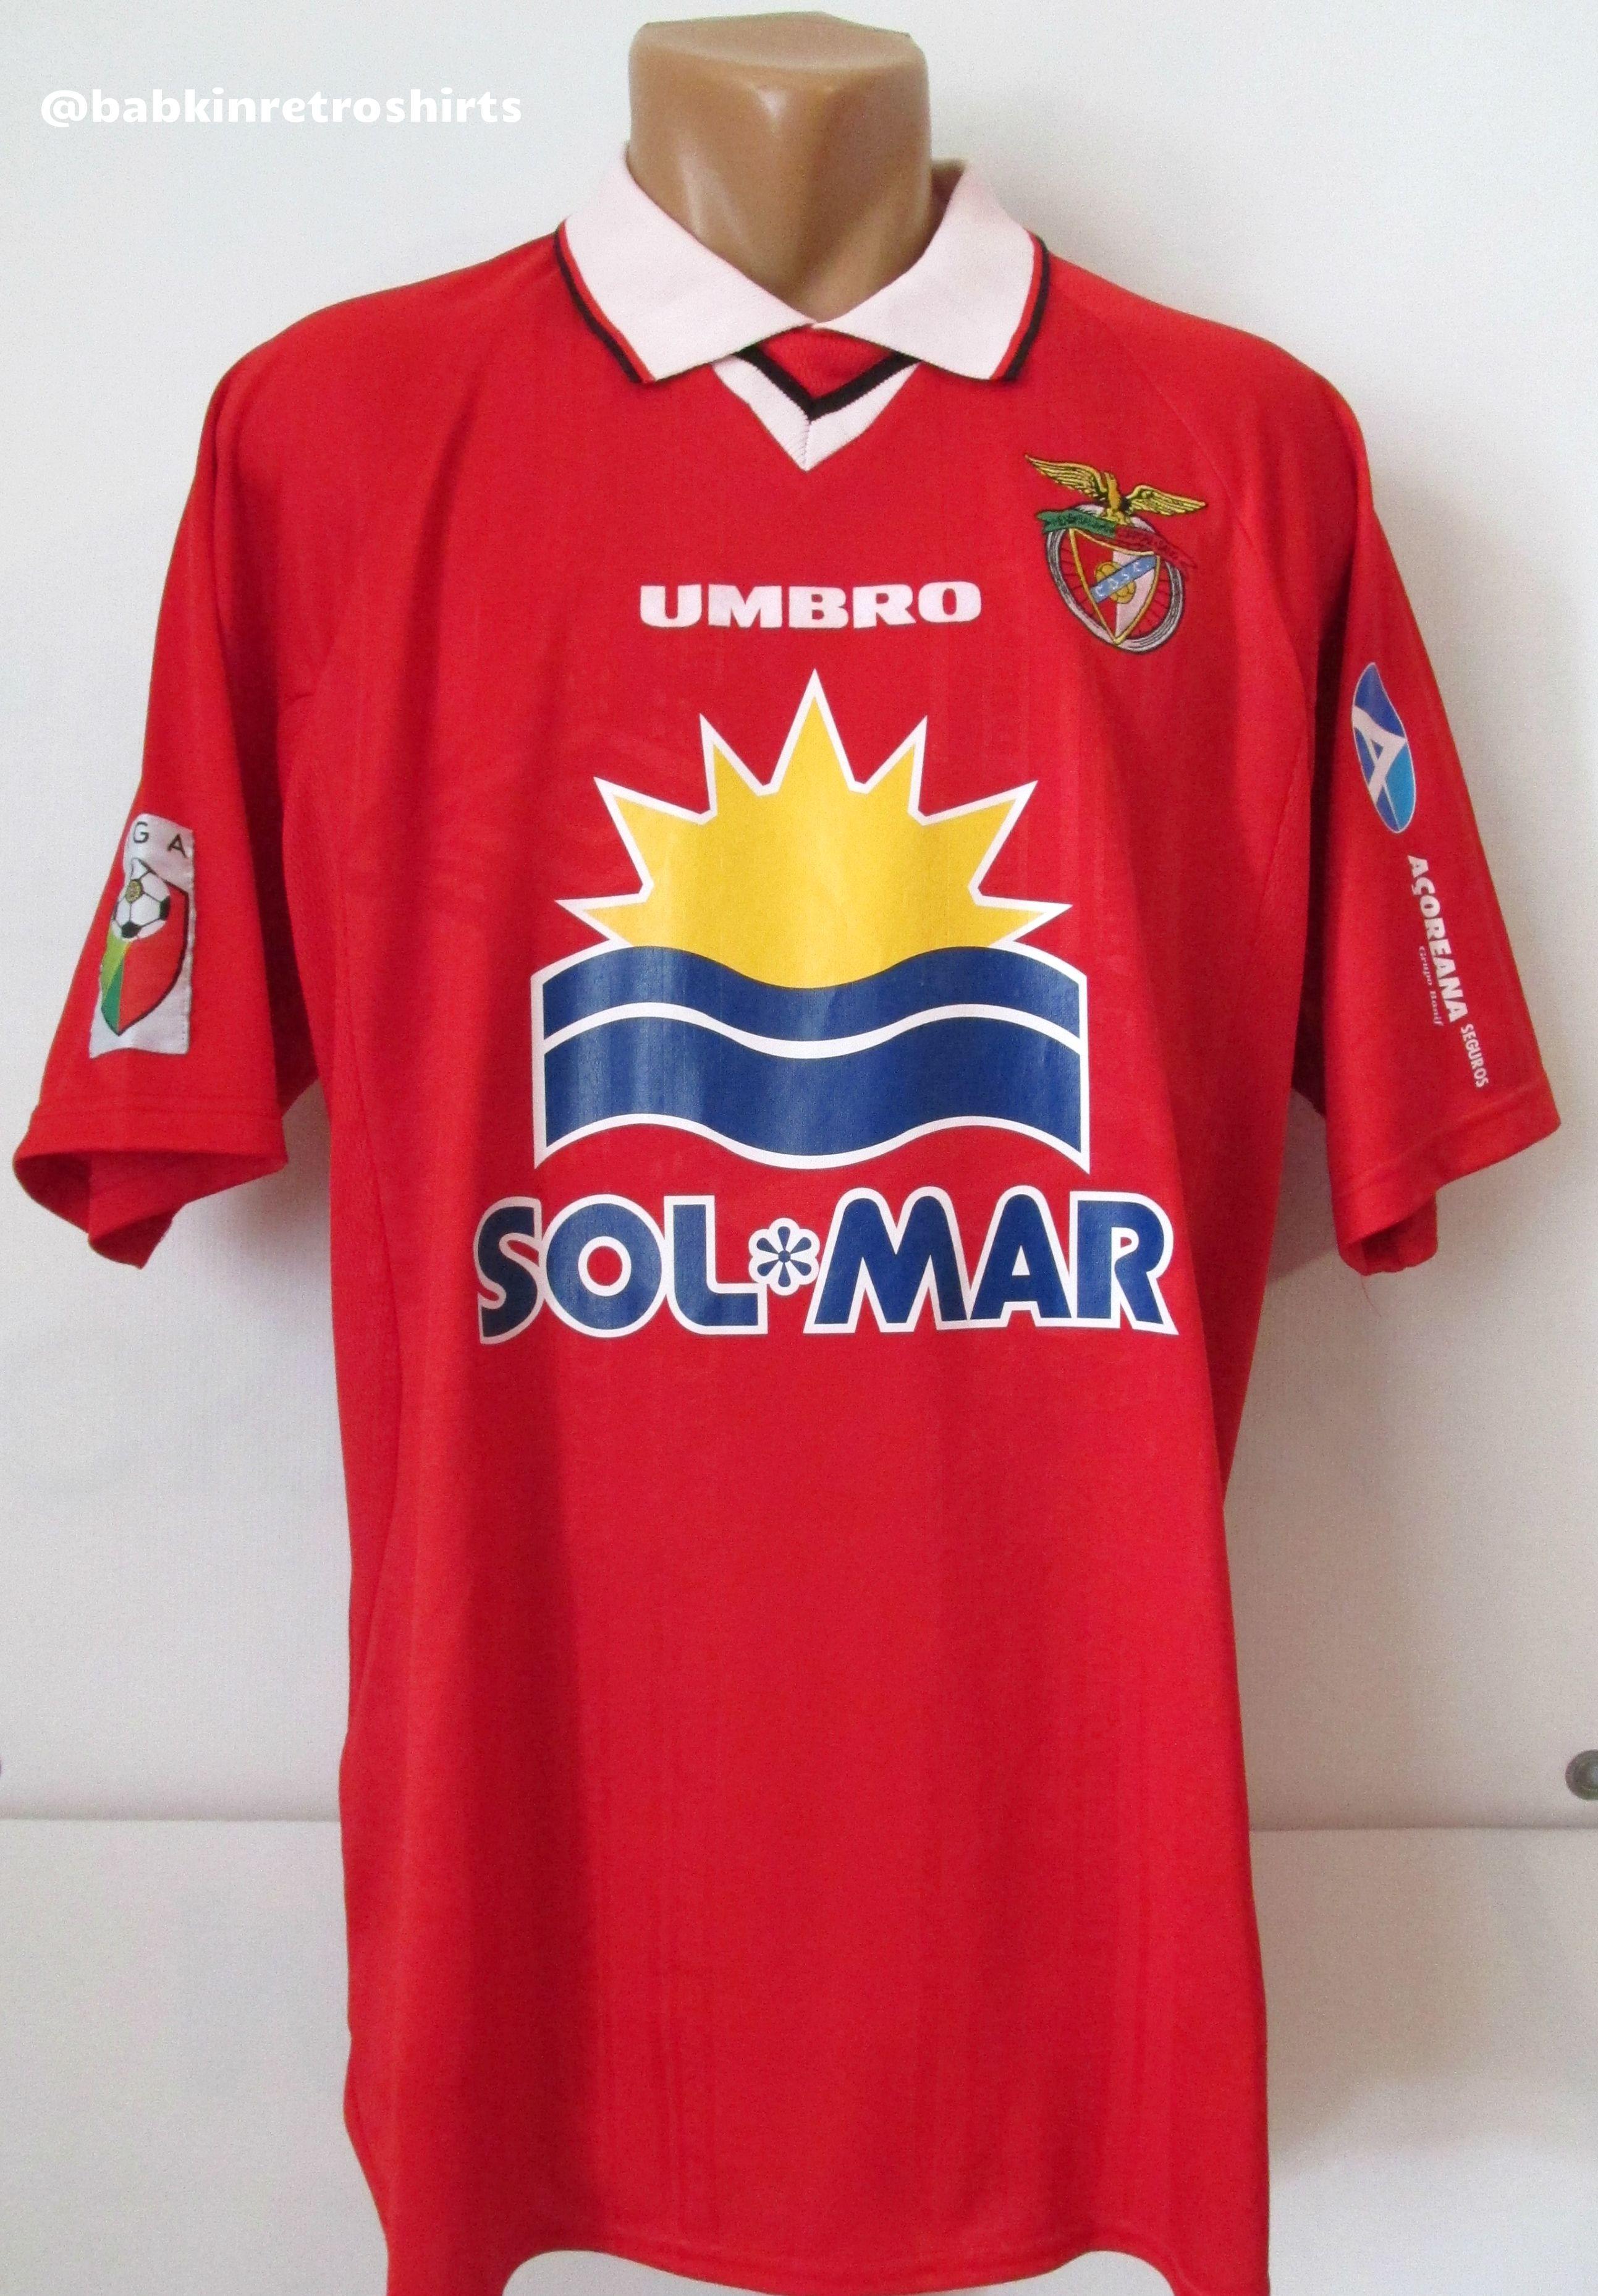 a9b6a7c26 CD Santa Clara 1998 1999 home match worn Luis Miguel  2 football shirt by  Umbro  CDSC  SantaClara  Portugal  vintage  90s  retro  rare  matchworn   açoreanos ...